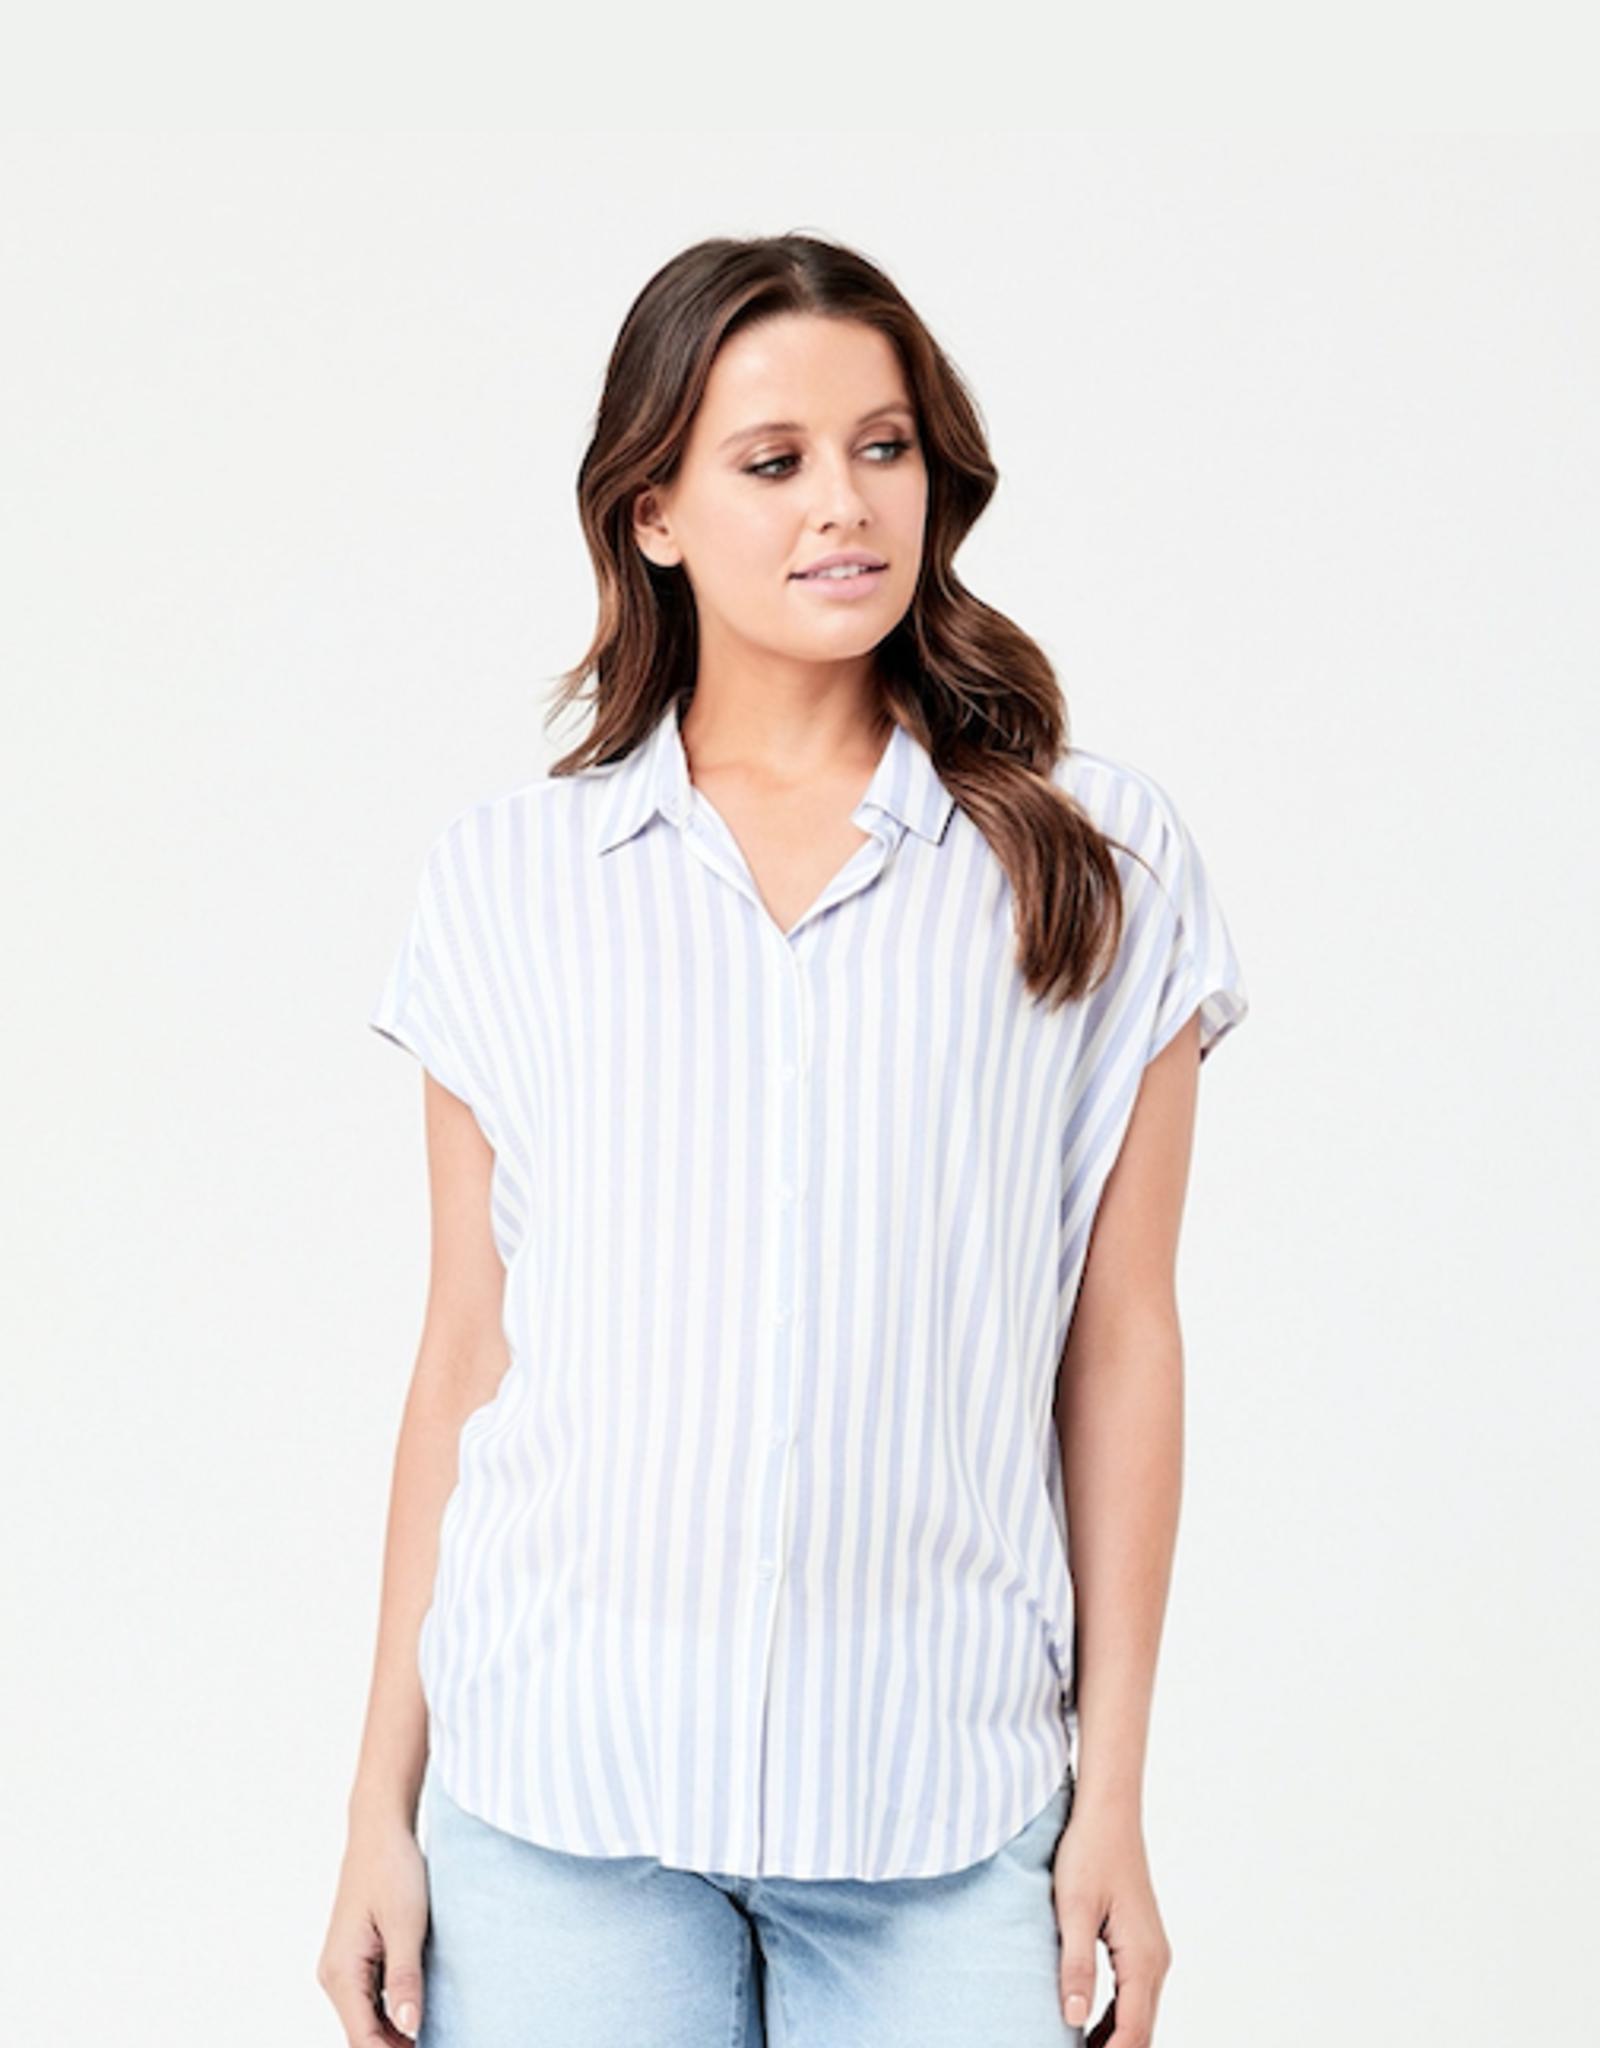 Ripe Maternity Quinn Relaxed Shirt in Blue/White